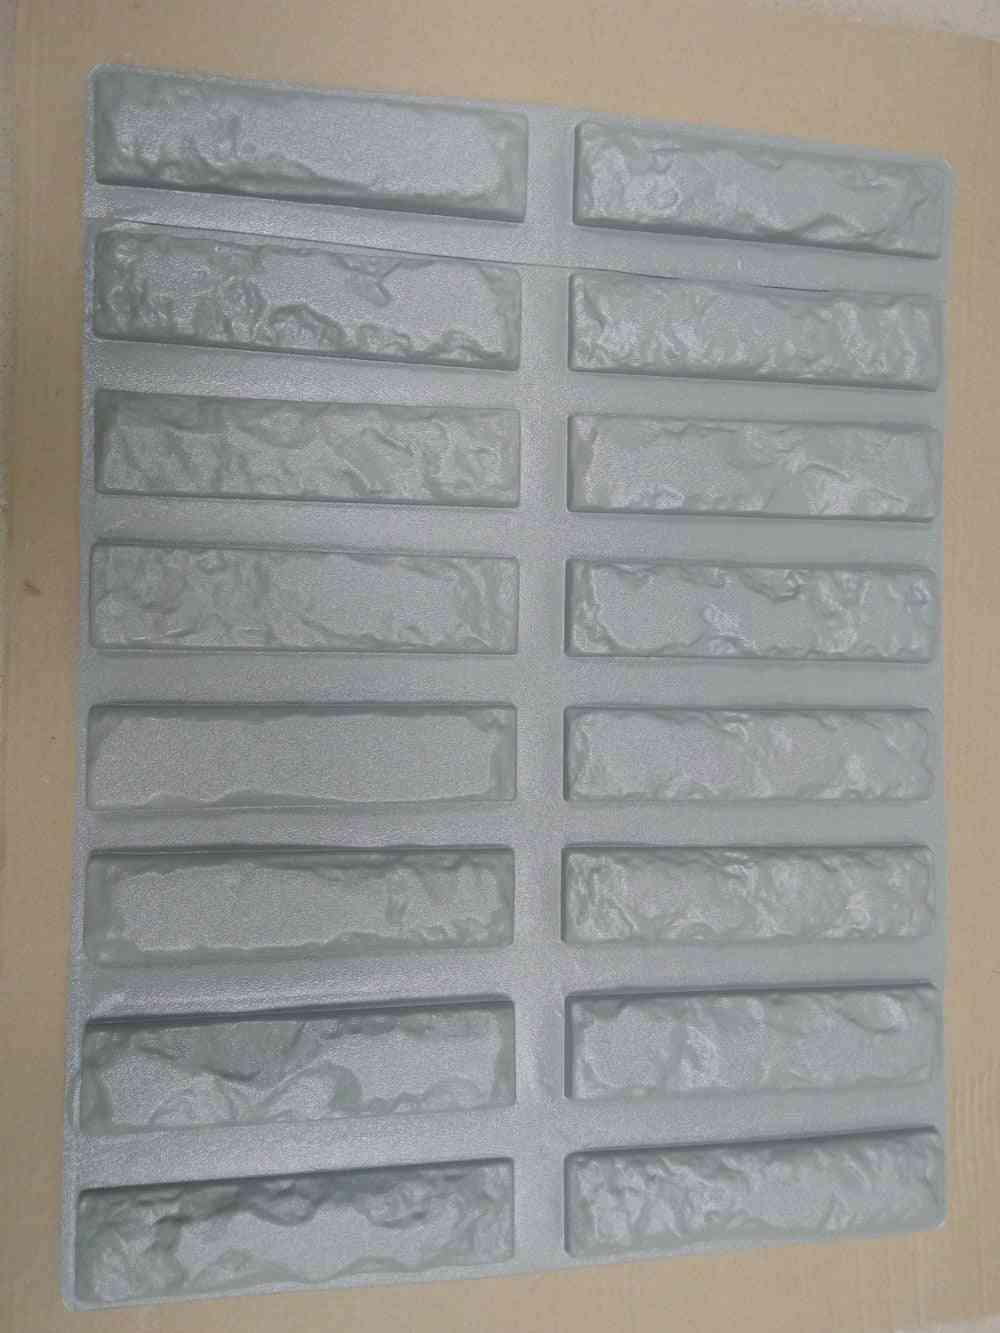 Plastic Molds For Concrete Plaster Super Best Price Wall Stone Cement Tiles Old Brick Decorative Design